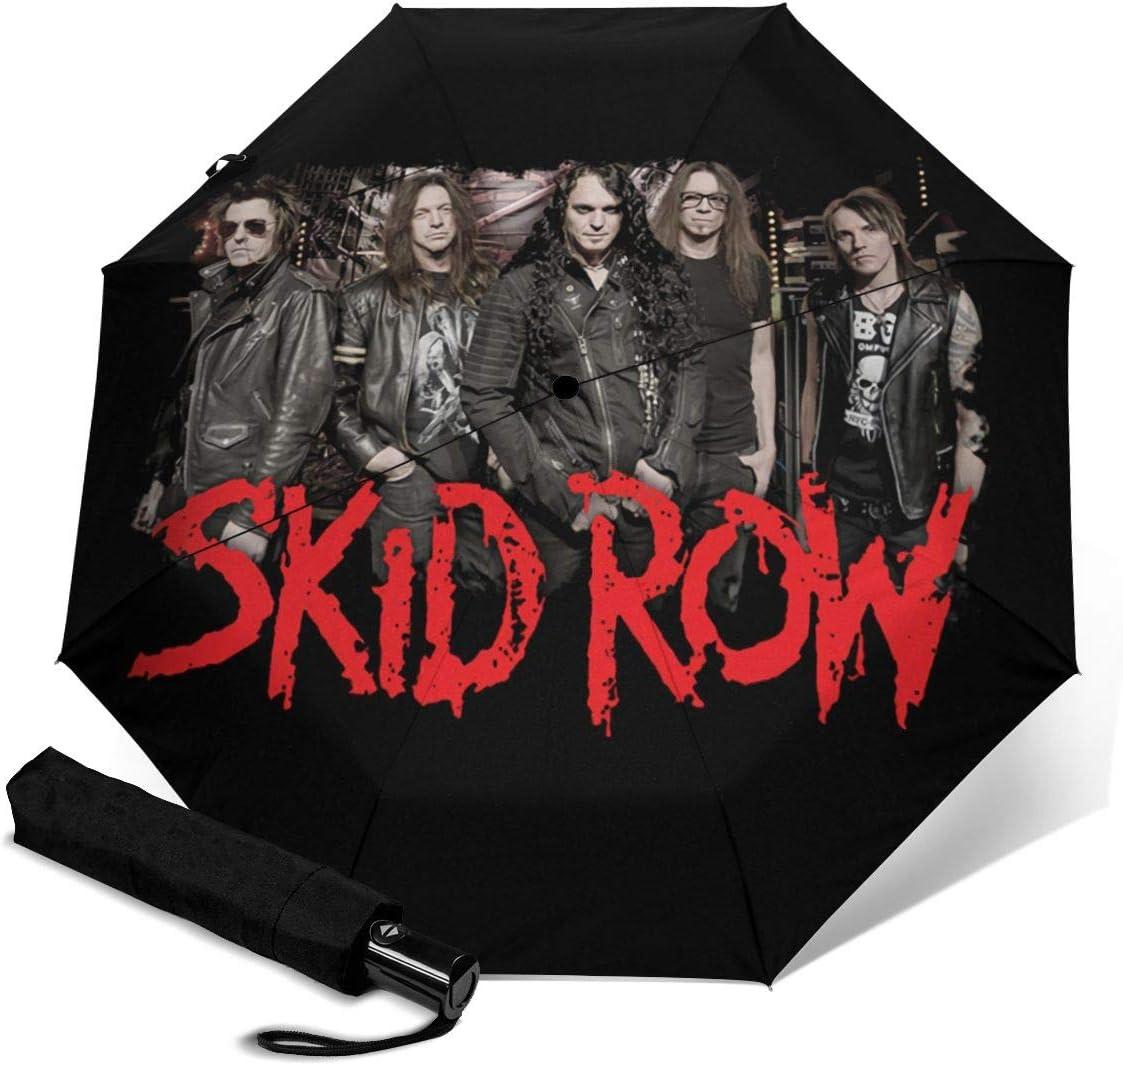 Skid Row Sun Protection Umbrella,Waterproof Travel Automatic Tri-fold Umbrellas